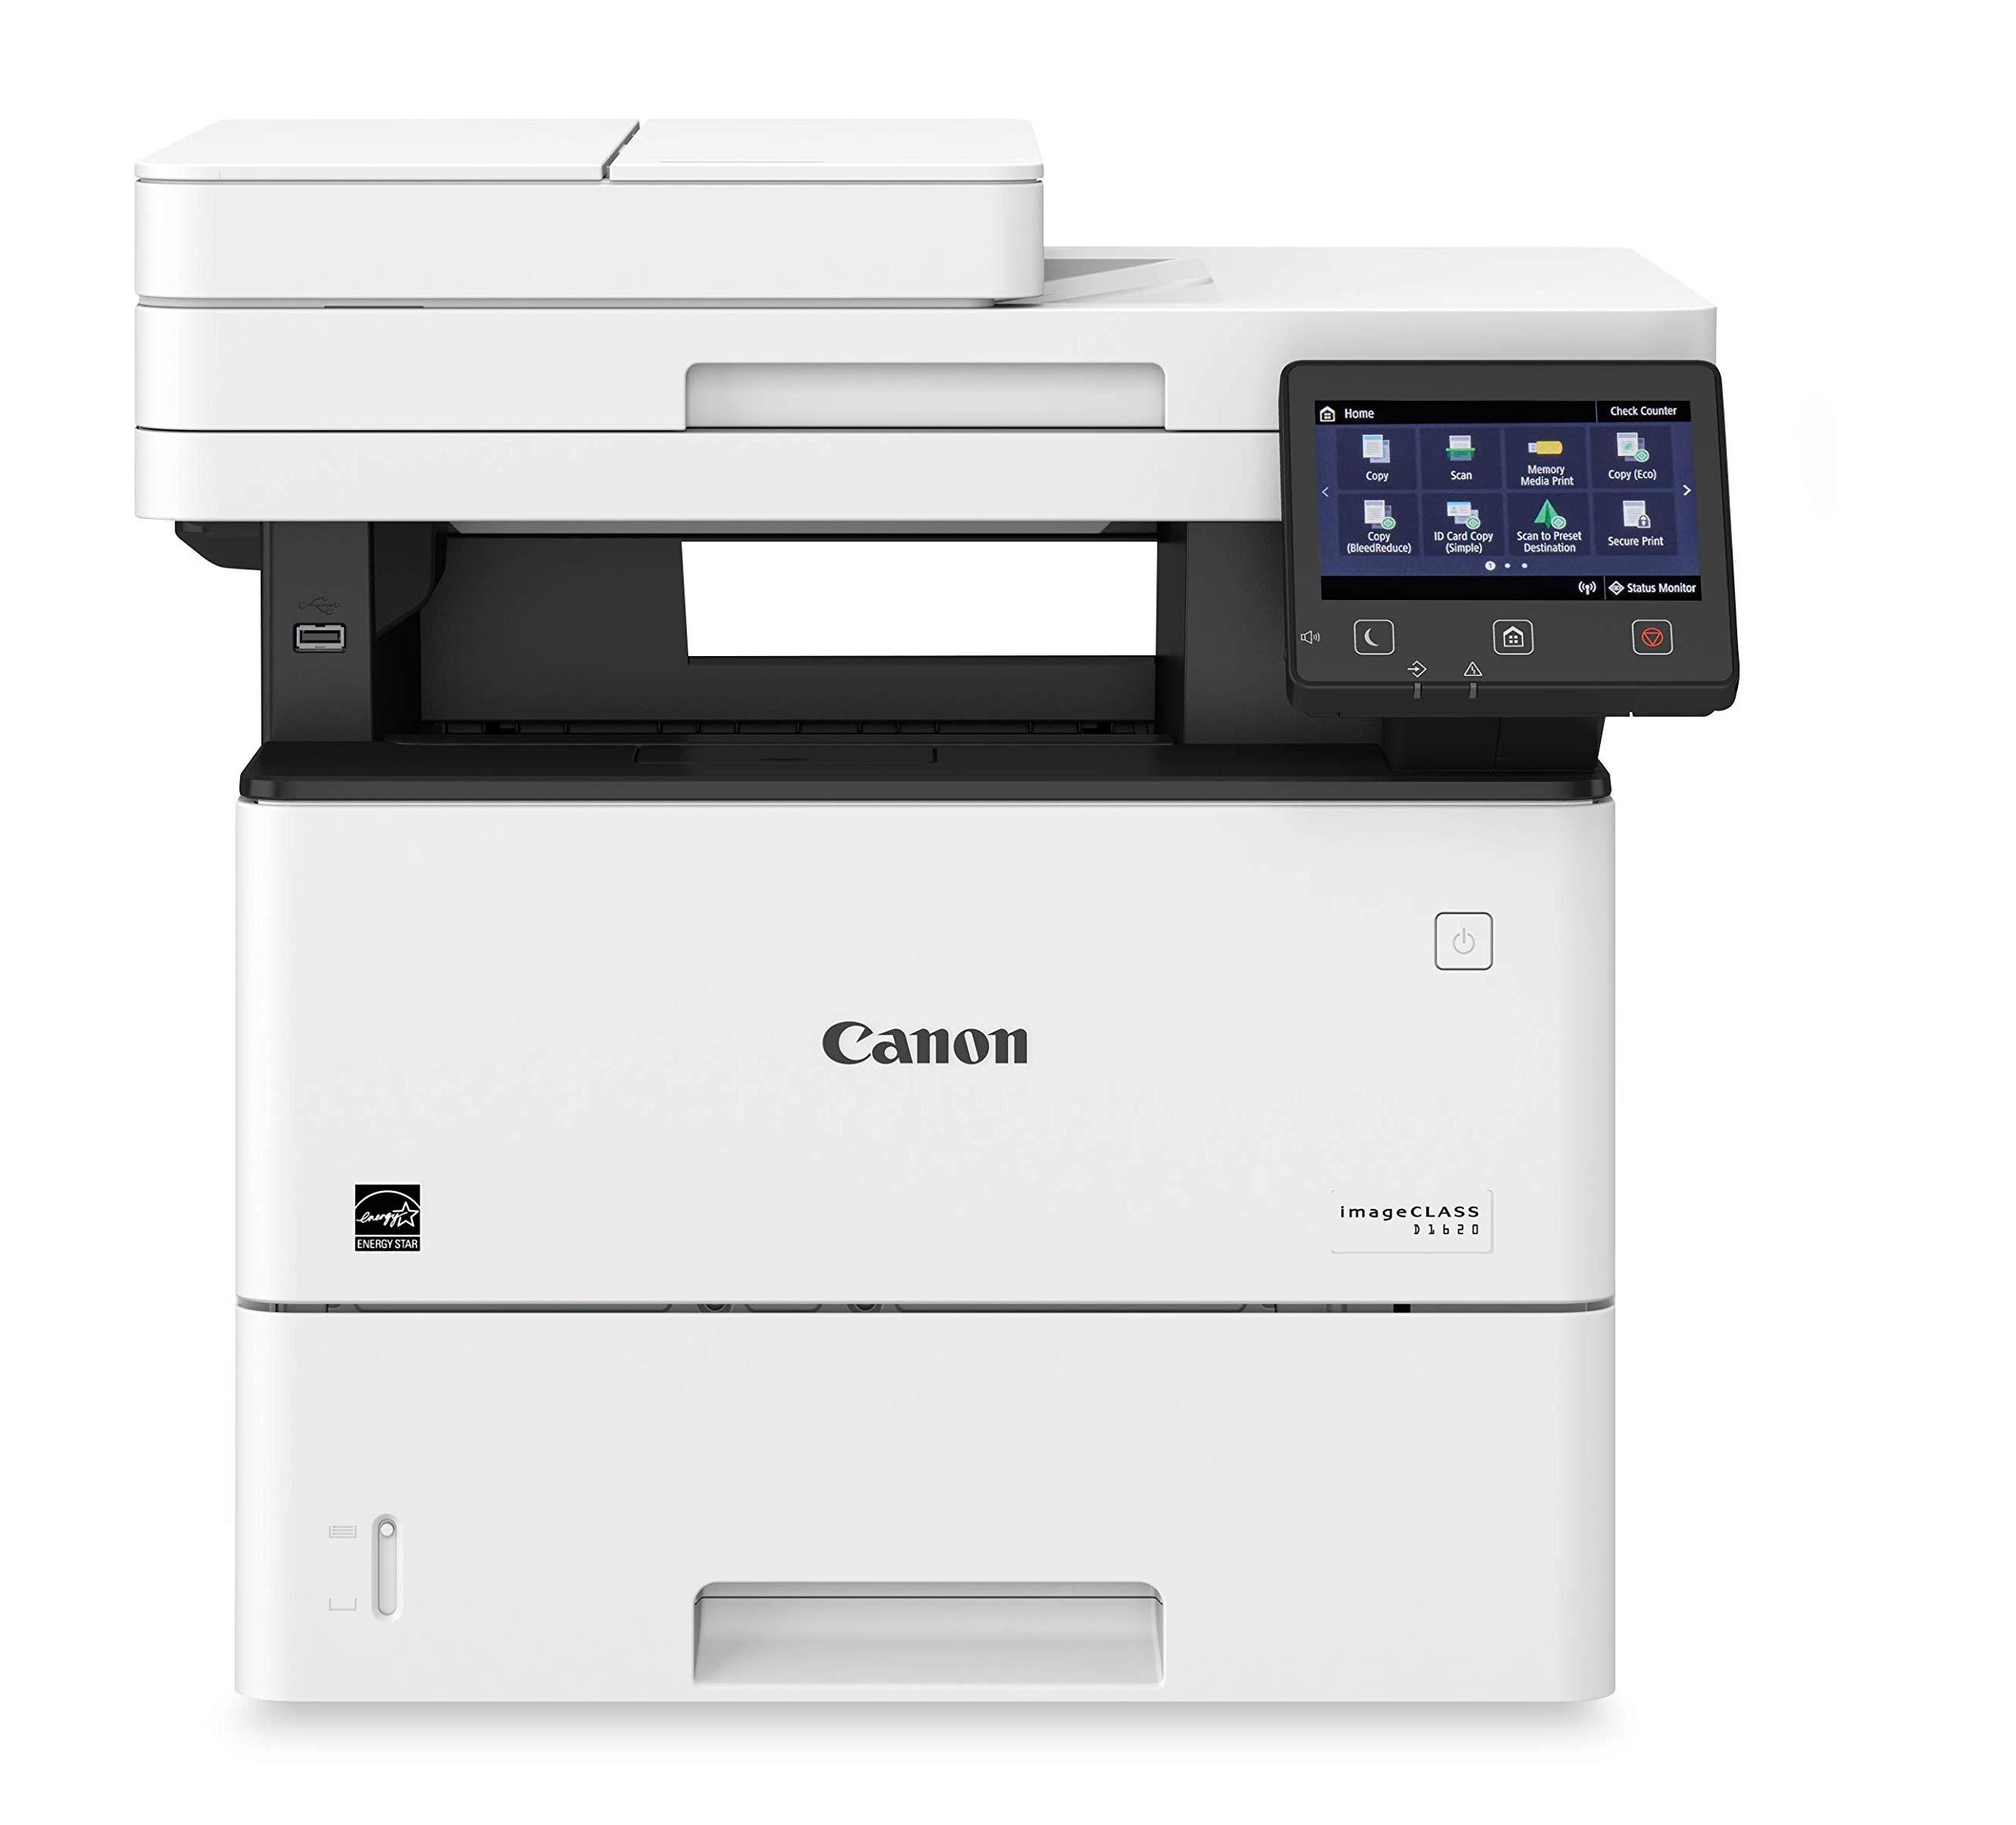 Canon imageCLASS 2223C024 Multifunction Wireless